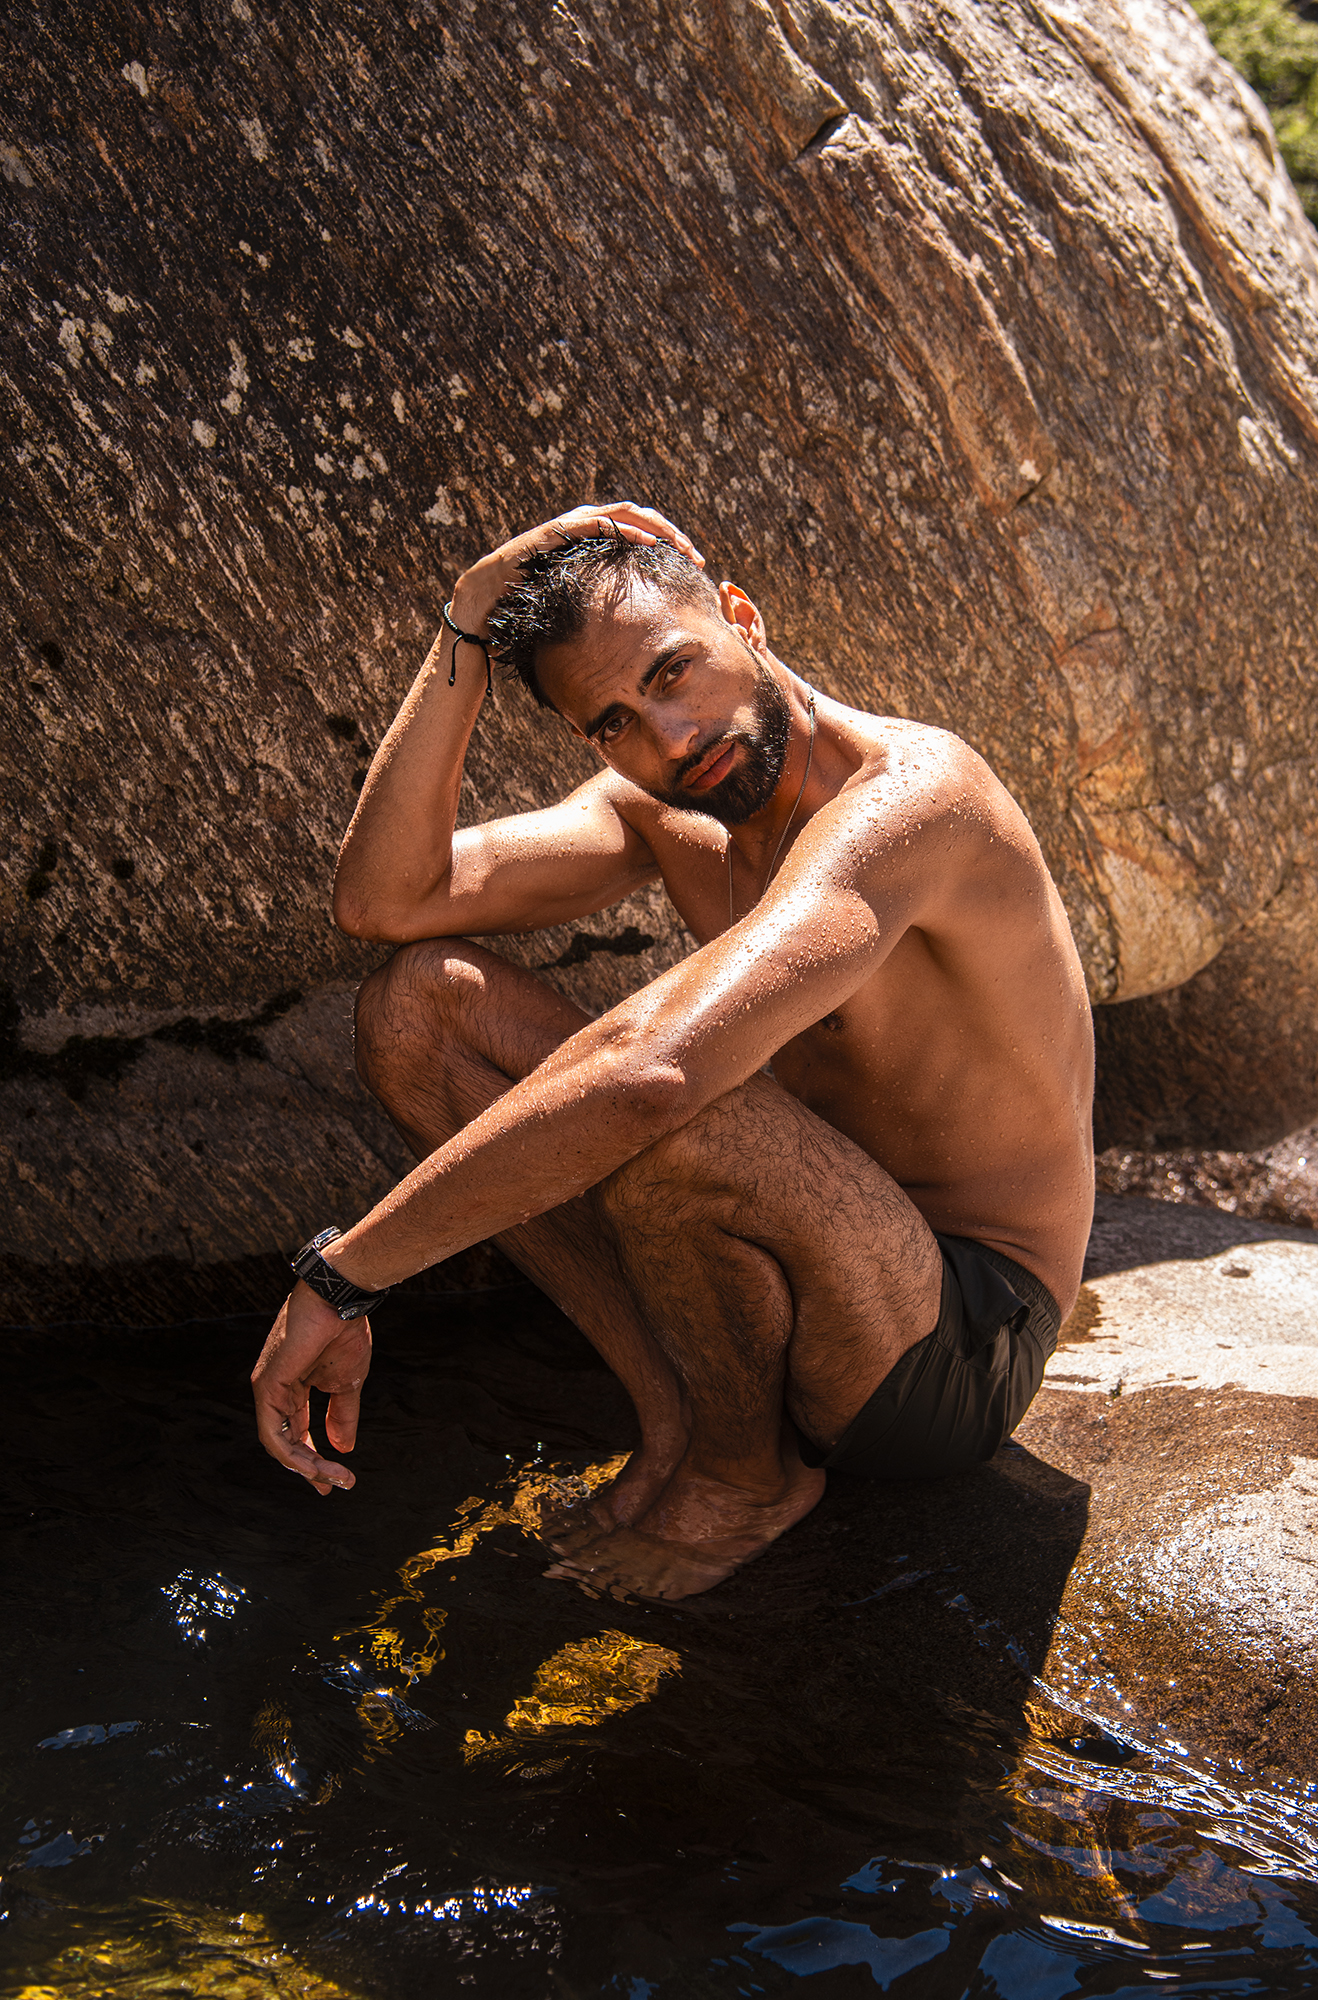 bruno martinez photographe